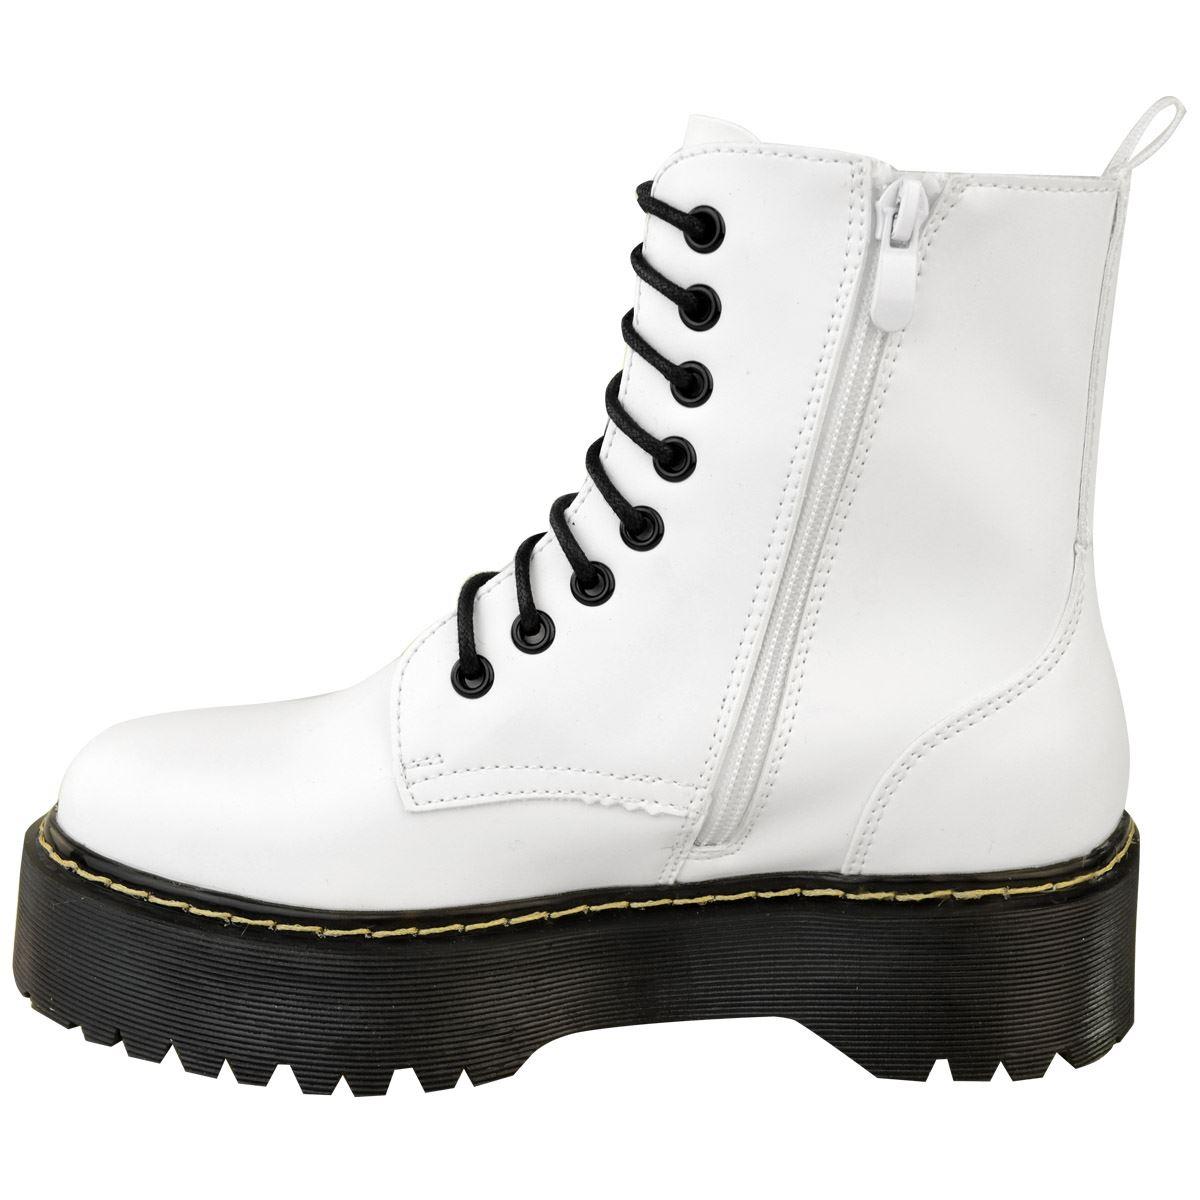 Womens-Ladies-Chunky-Lace-Up-Ankle-Boots-Platform-Icon-Retro-Goth-Punk-Black miniatuur 20